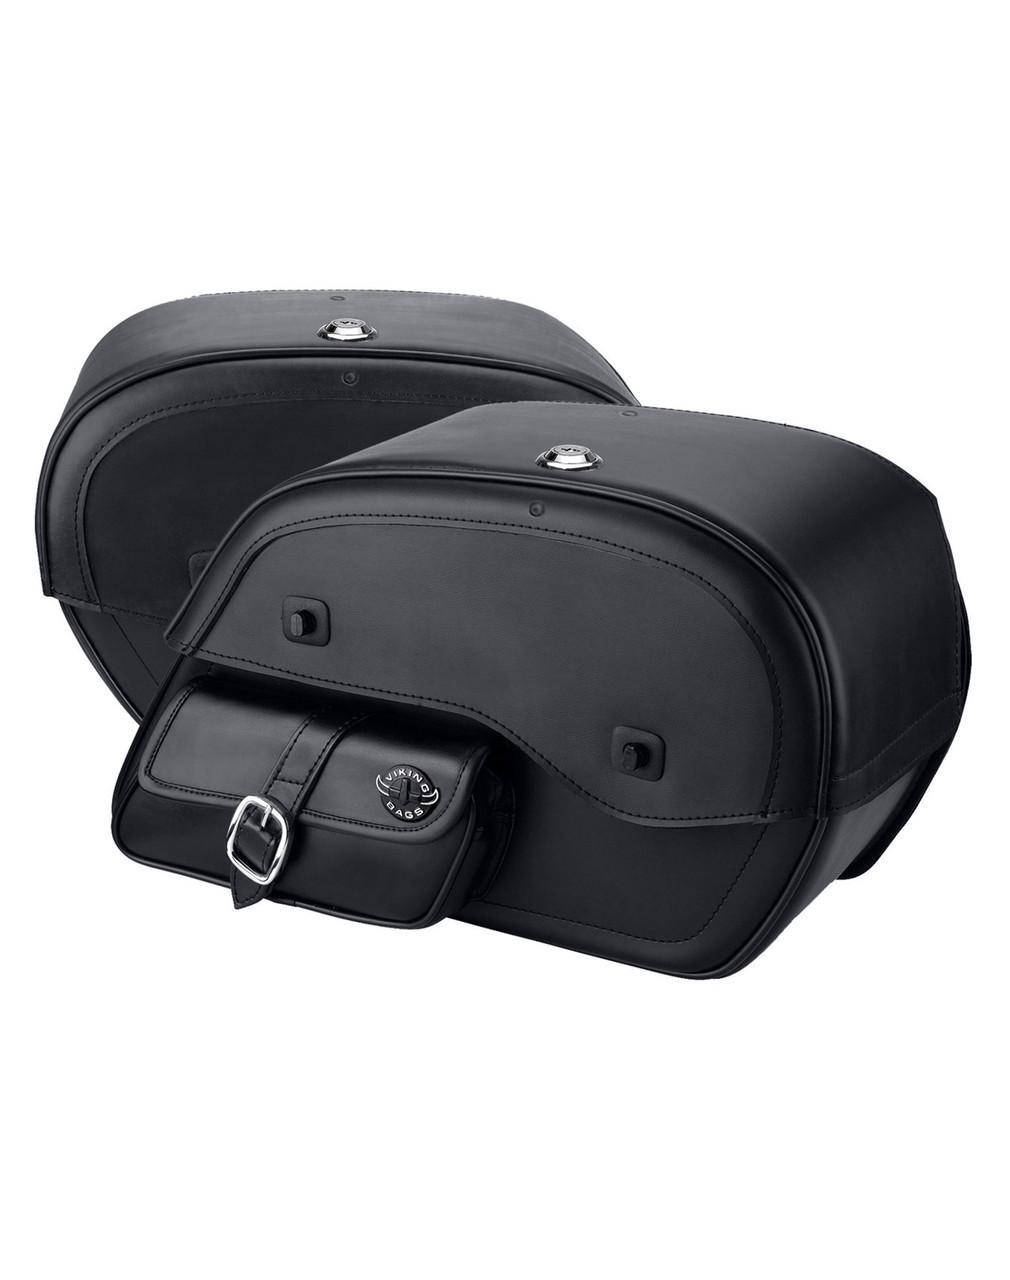 Kawasaki Vulcan 900 Custom Side Pocket Bags Large Motorcycle Saddlebags Both Bags View